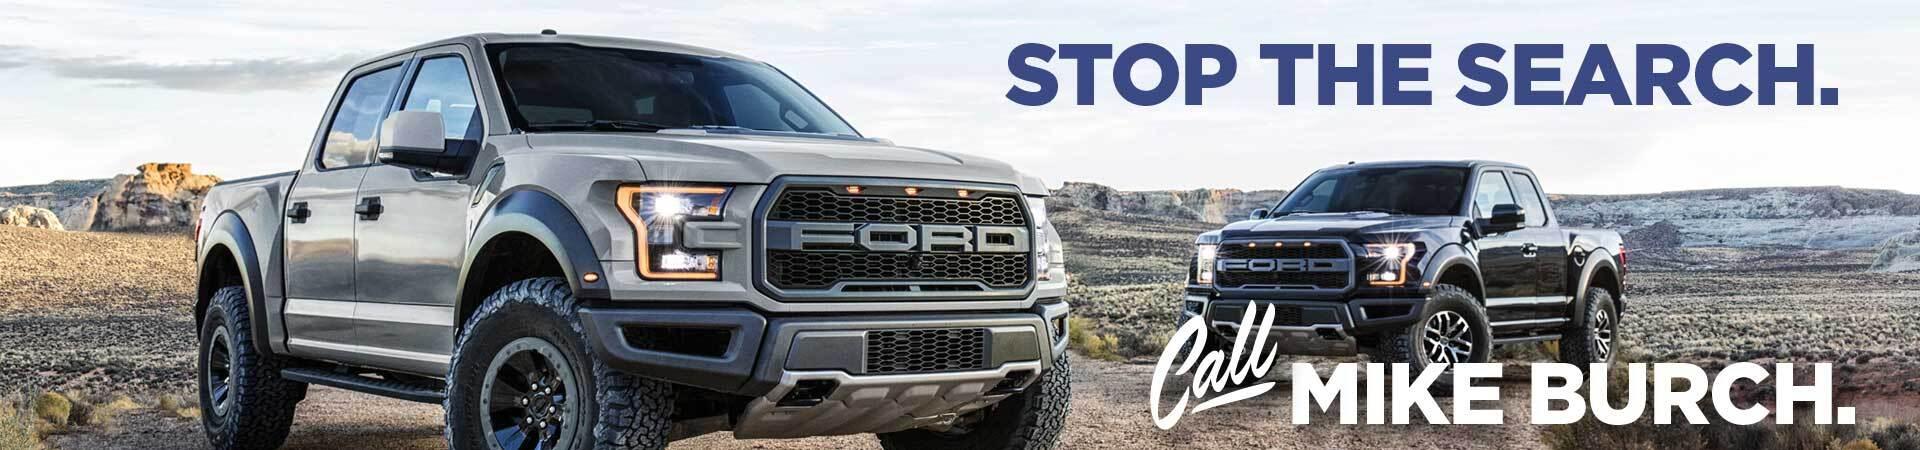 Ford Dealership Blackshear Ga Used Cars Mike Burch Ford